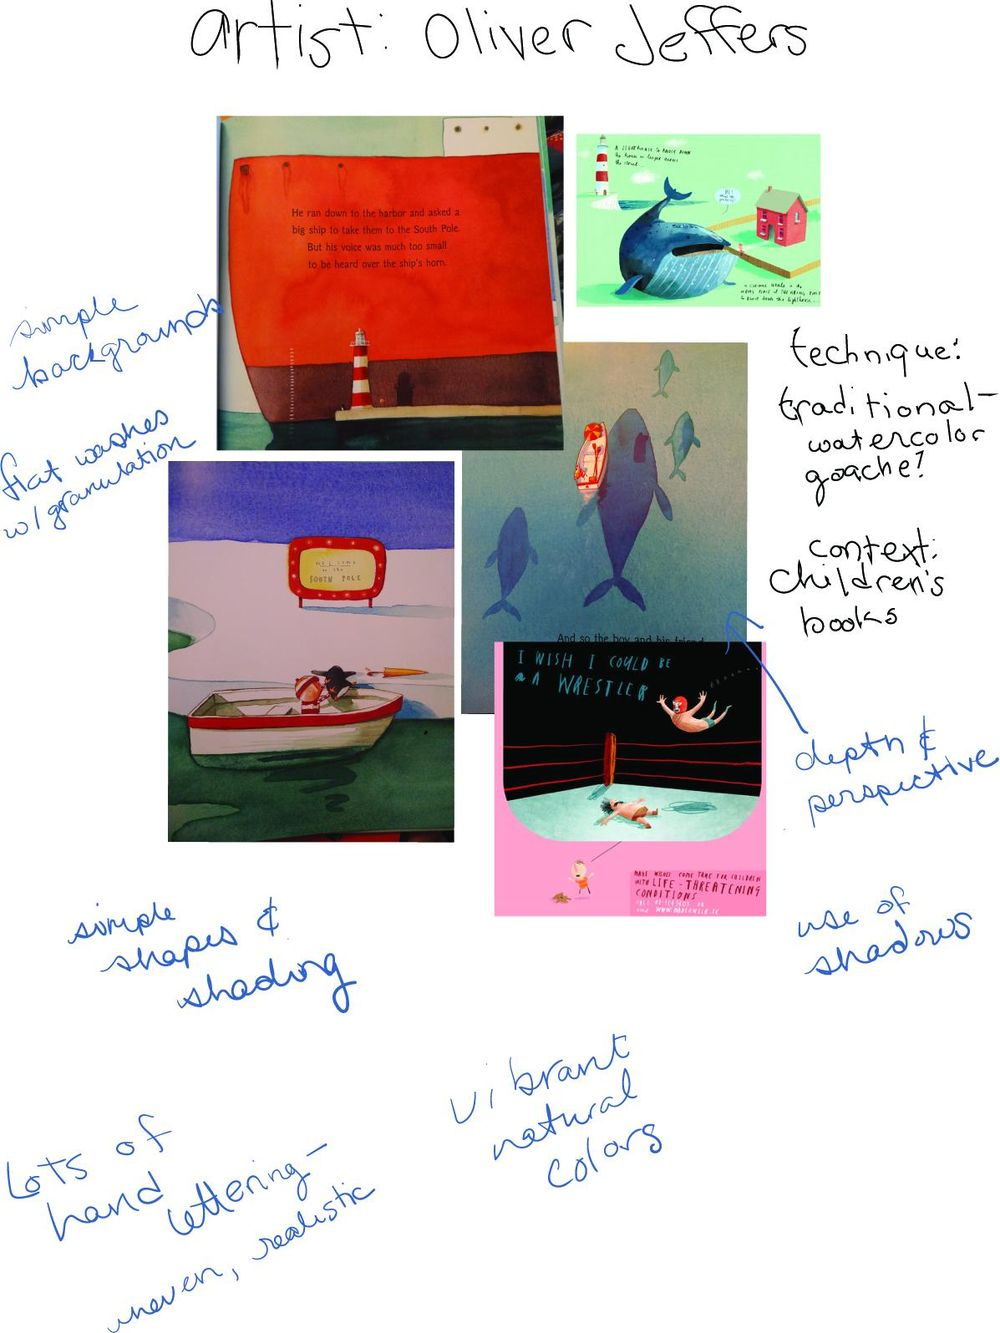 Inspiration Study - Oliver Jeffers - image 1 - student project